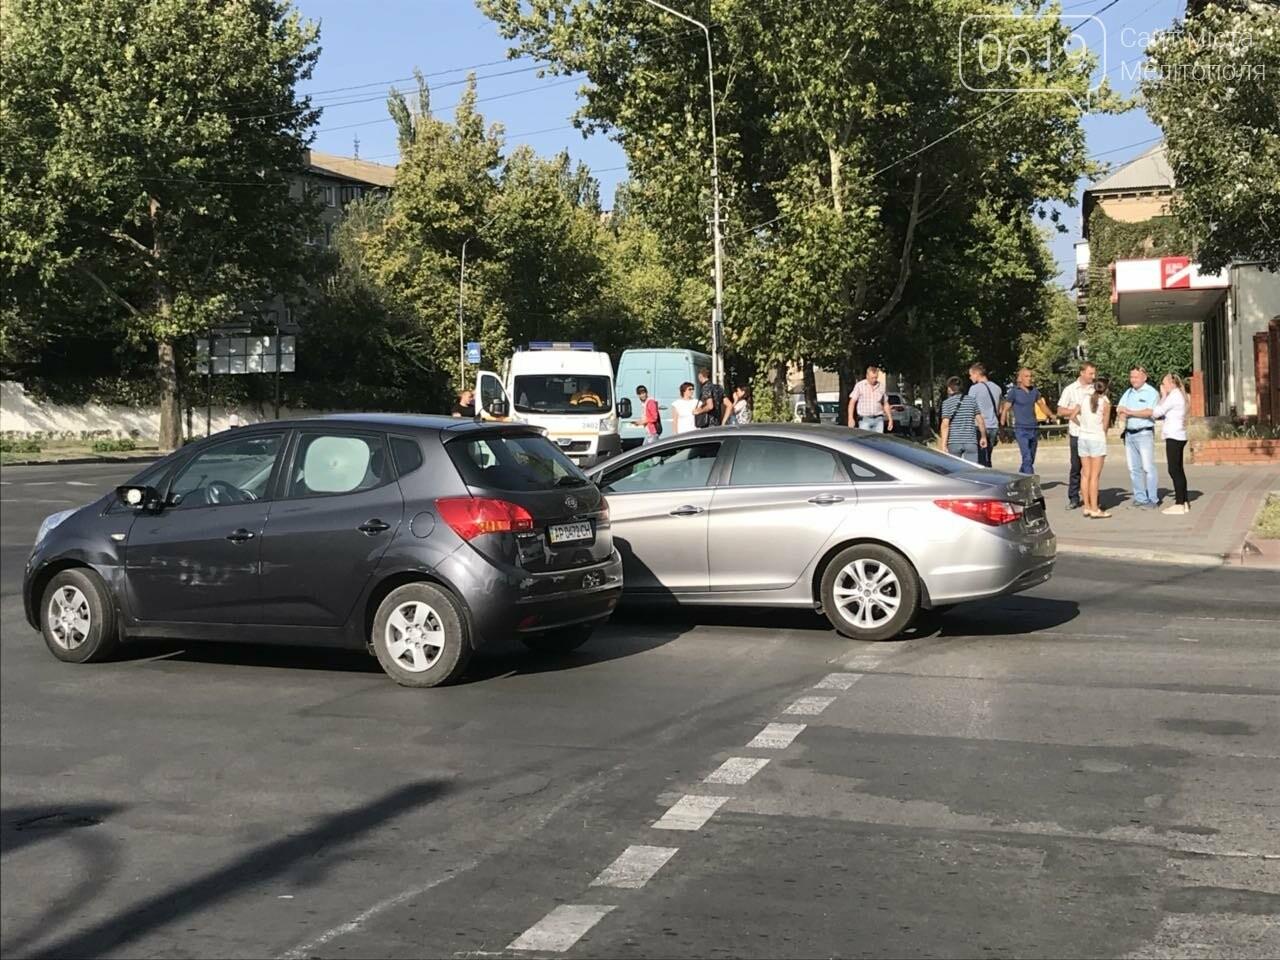 В Мелитополе на пешеходном переходе сбили девушку, - ФОТО, фото-3, Фото сайта 0619